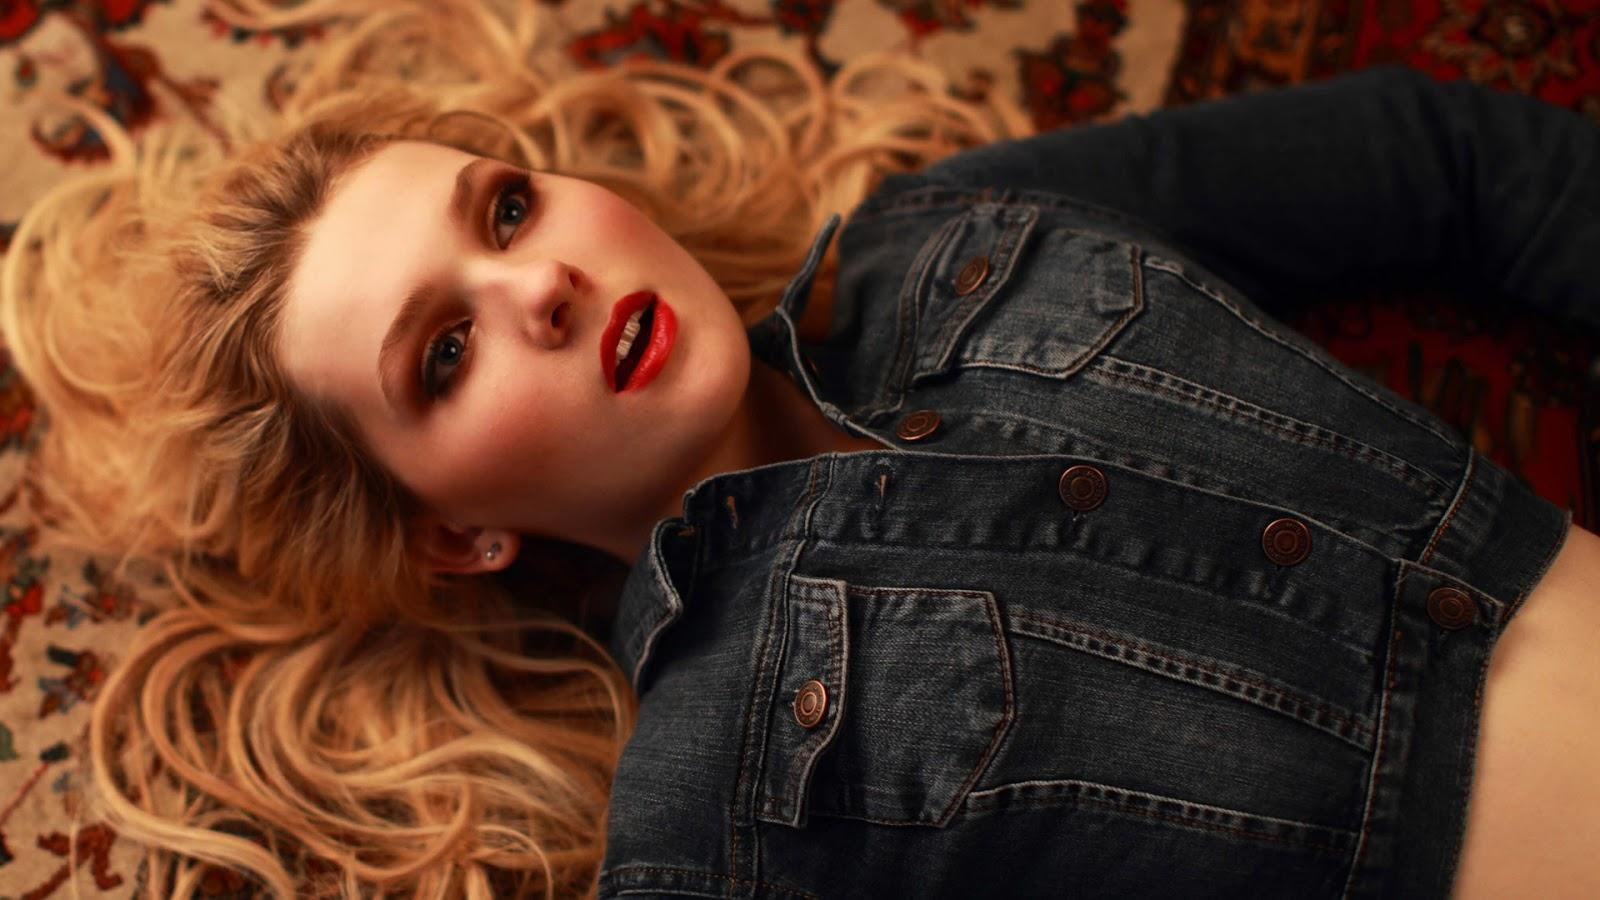 Red Lips of Abigail Breslin